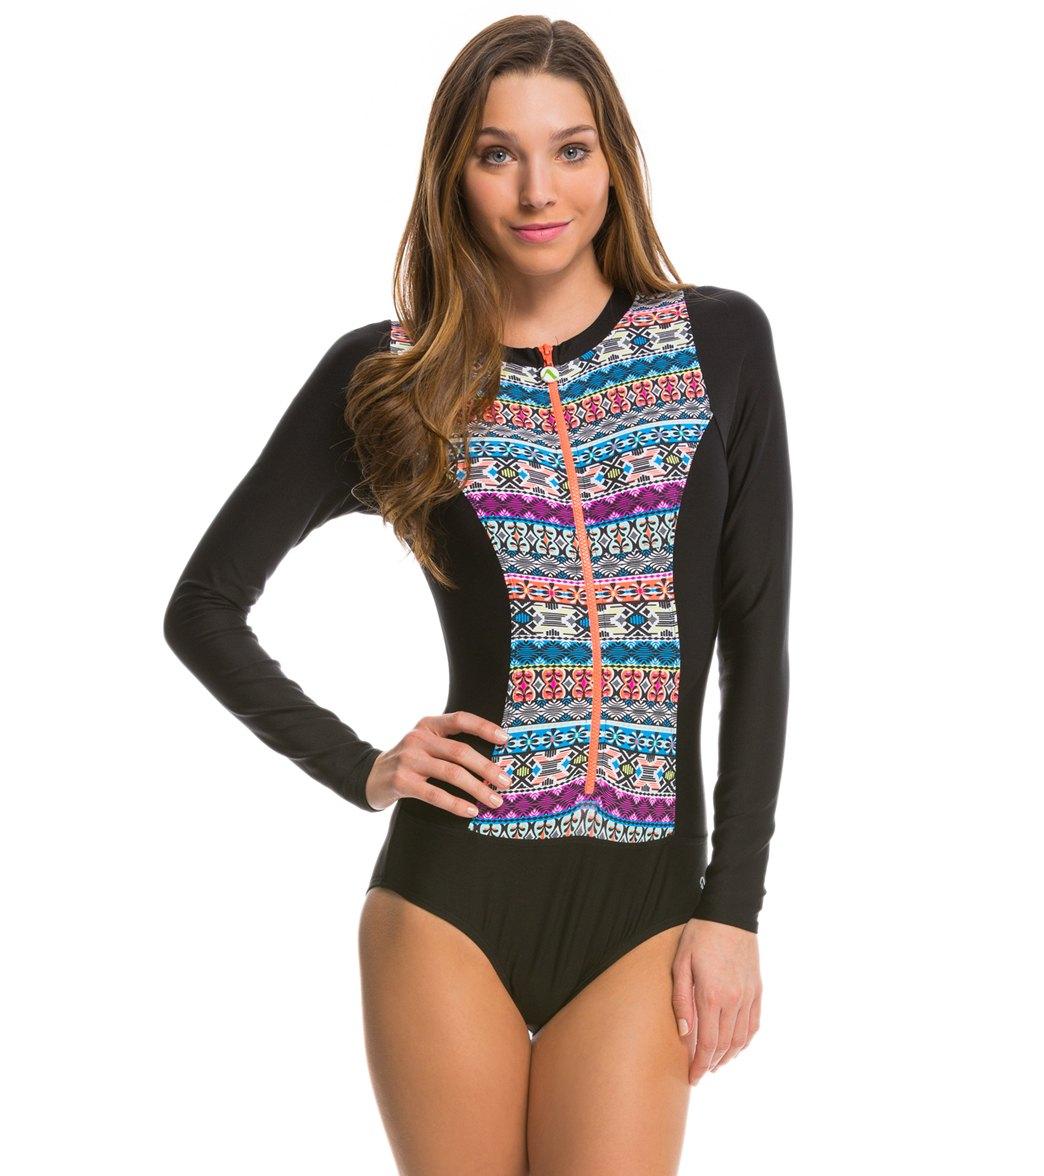 db0ff71de2 Next Find Your Chi L S Malibu One Piece Swimsuit at SwimOutlet.com ...